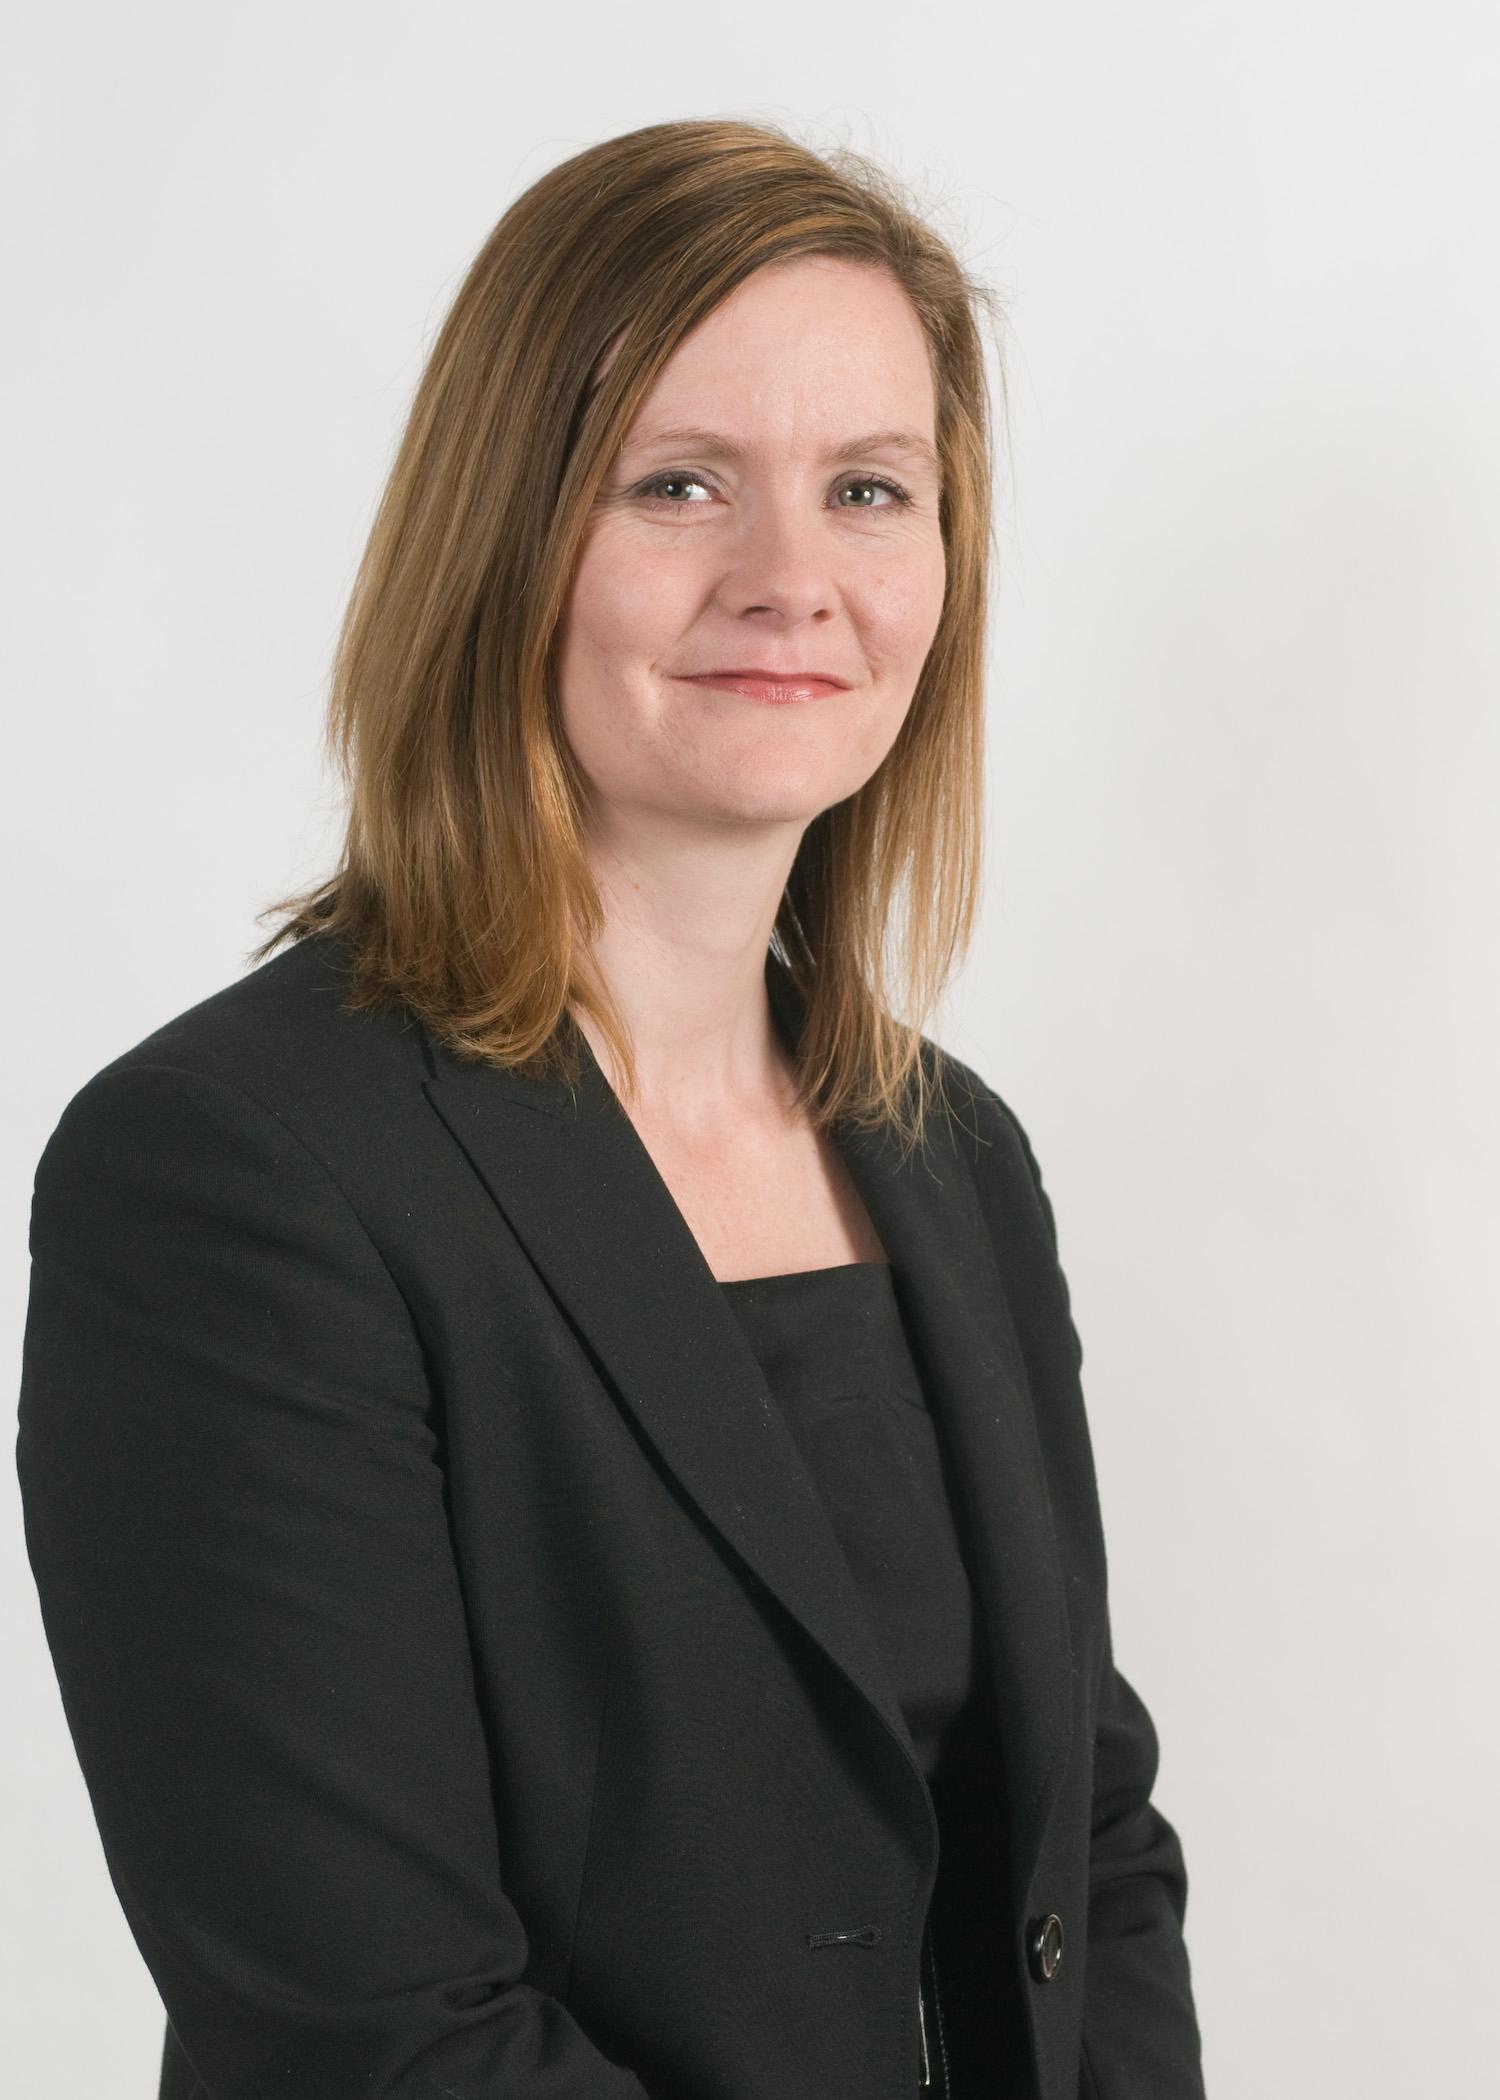 Caroline Kelly